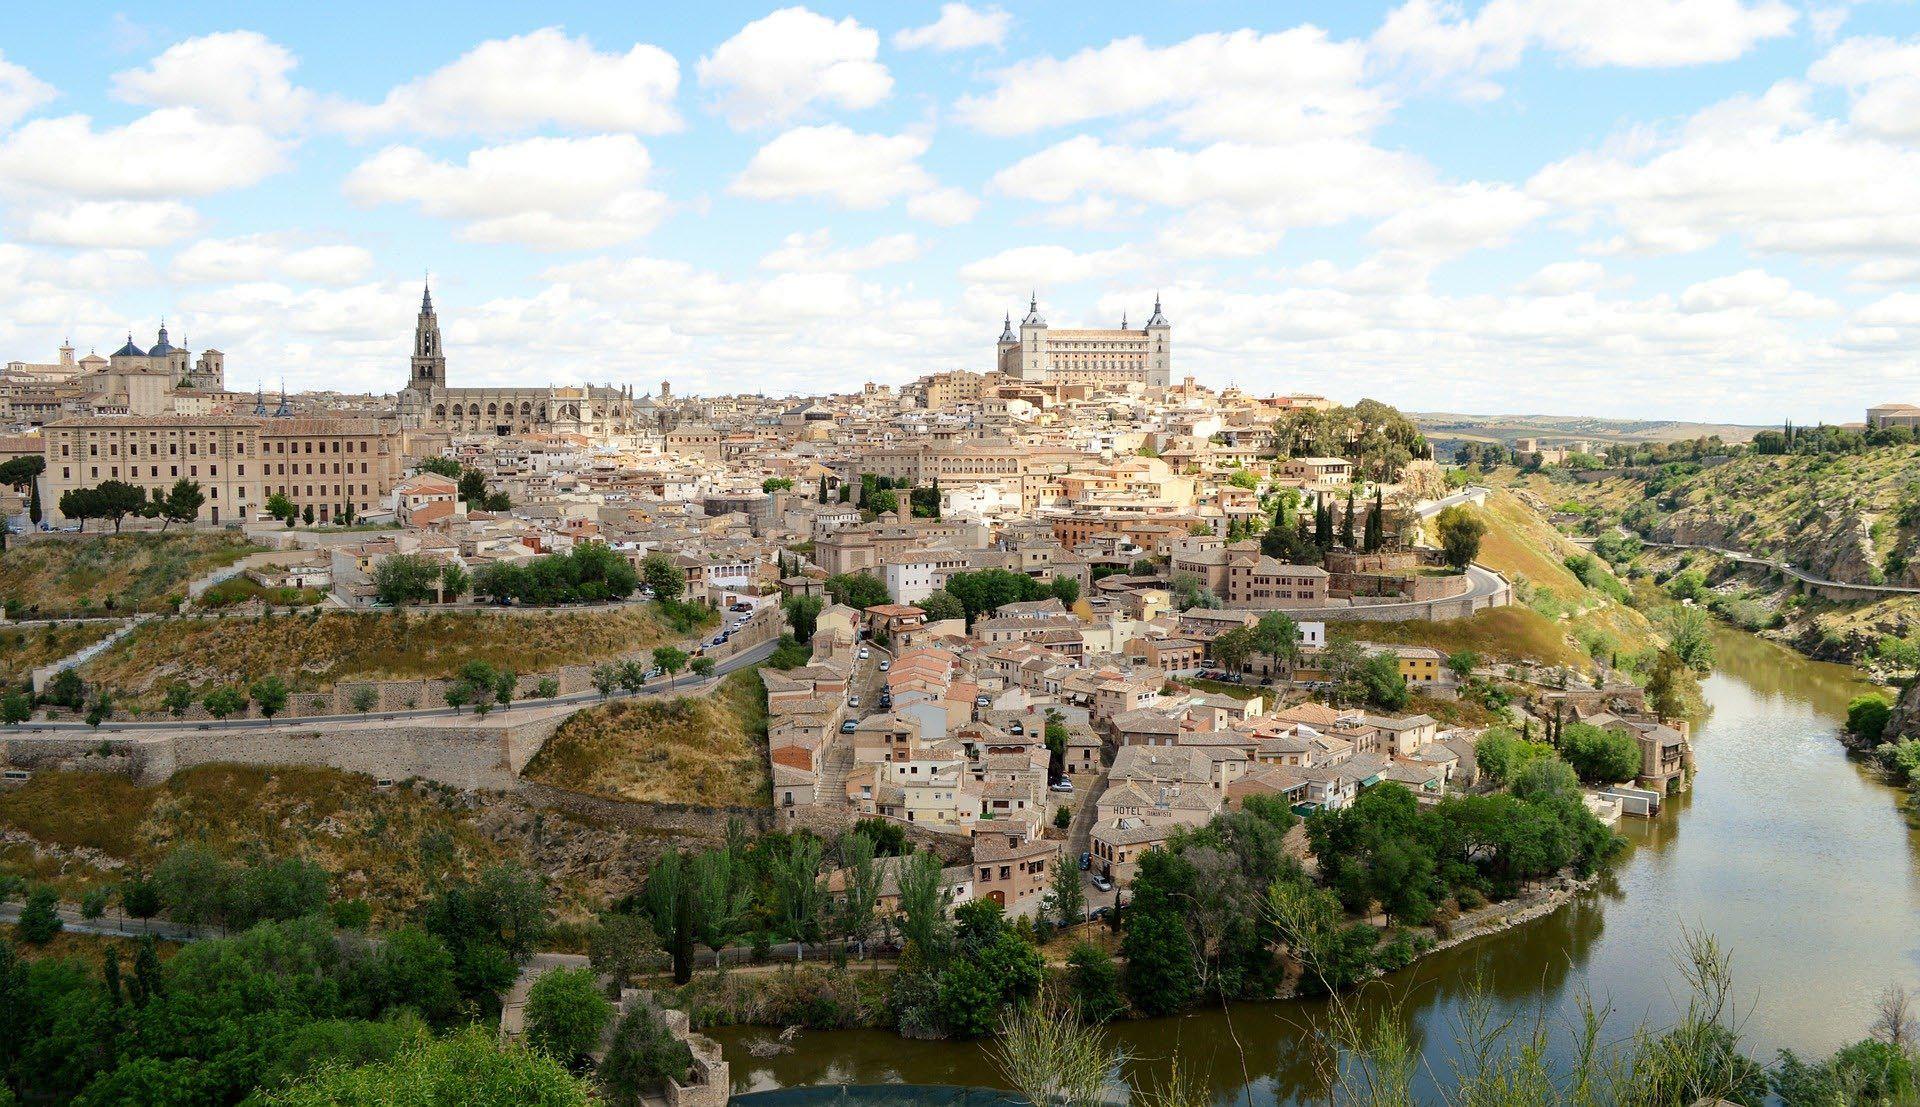 Fotografia Toledo. Nace el grupo de trabajo del CSCAE 'Arquitectos +